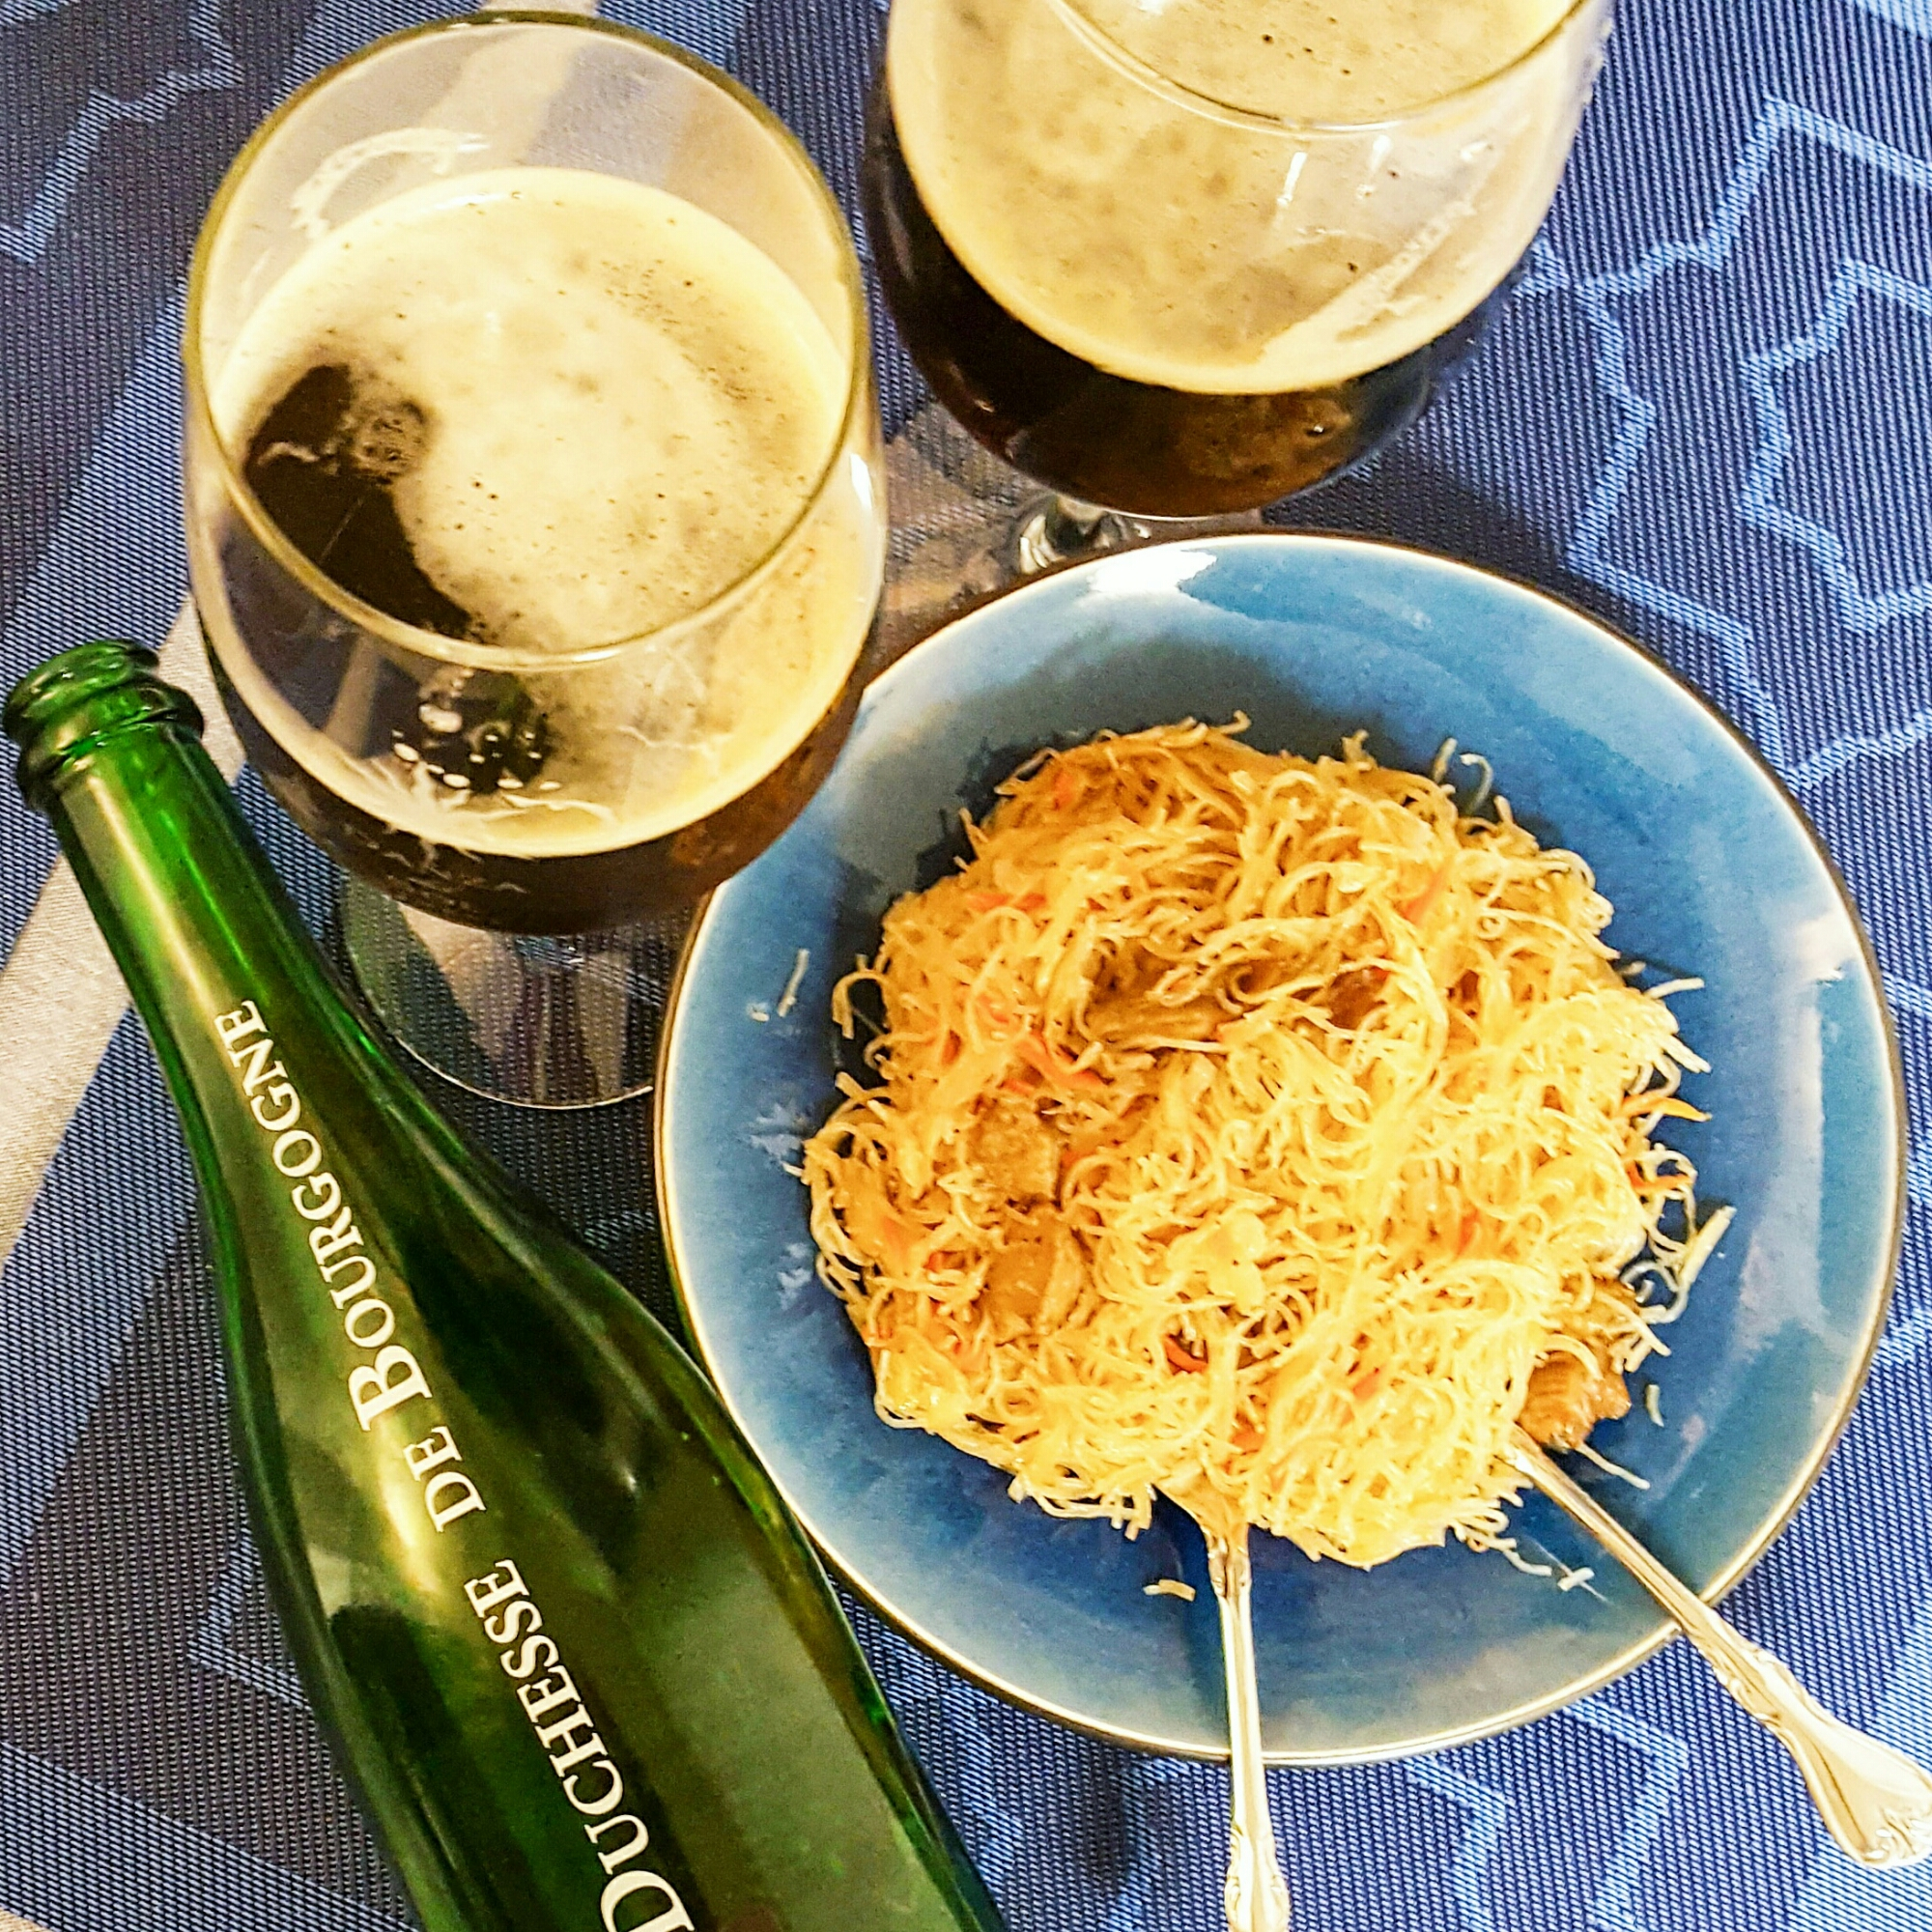 Filipino food wine pairing - Pancit